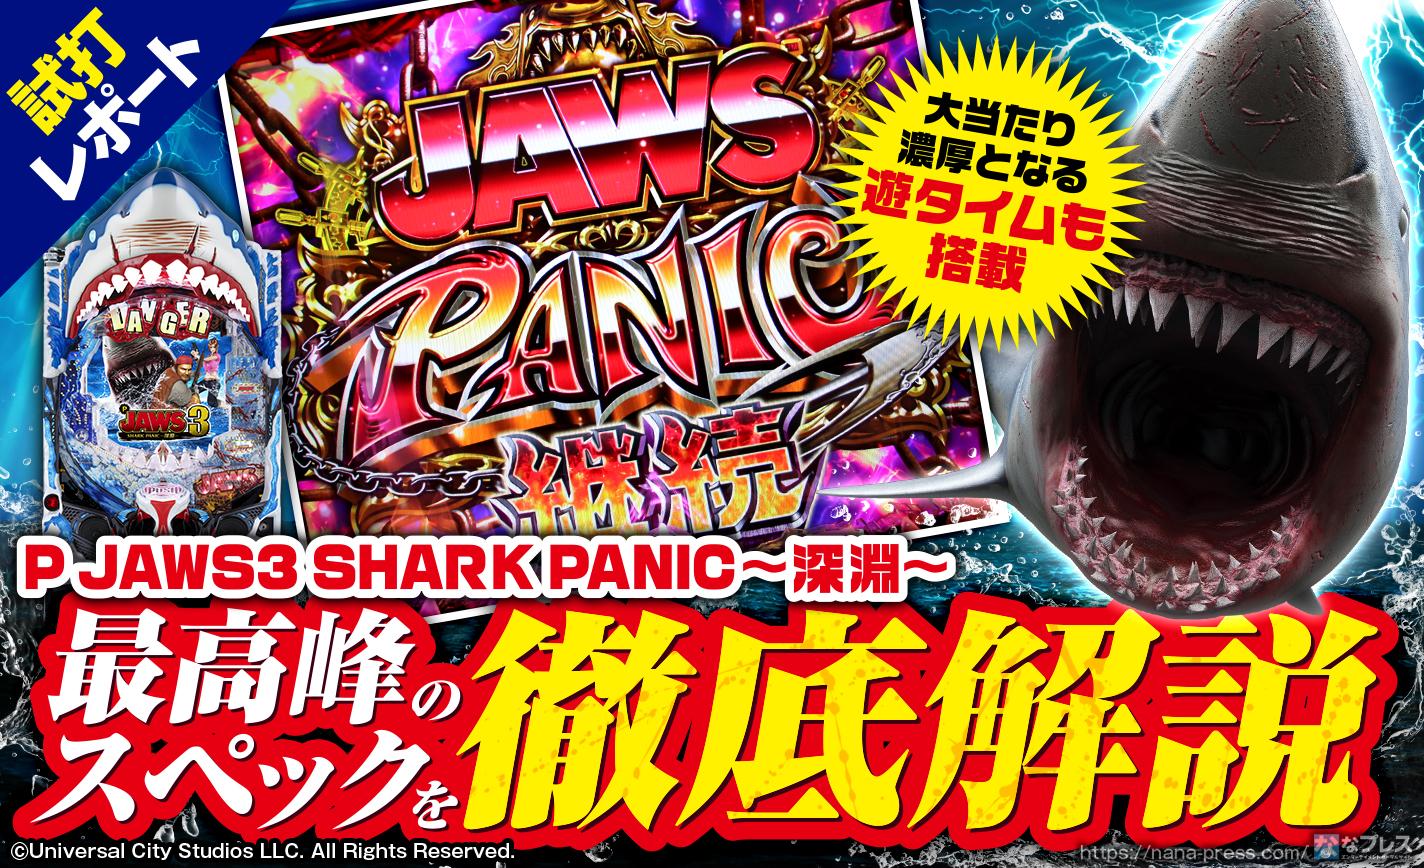 【P JAWS3 SHARK PANIC~深淵~ 試打#1】最高峰のスペックを徹底解説!大当たり濃厚となる遊タイムも搭載!? eyecatch-image